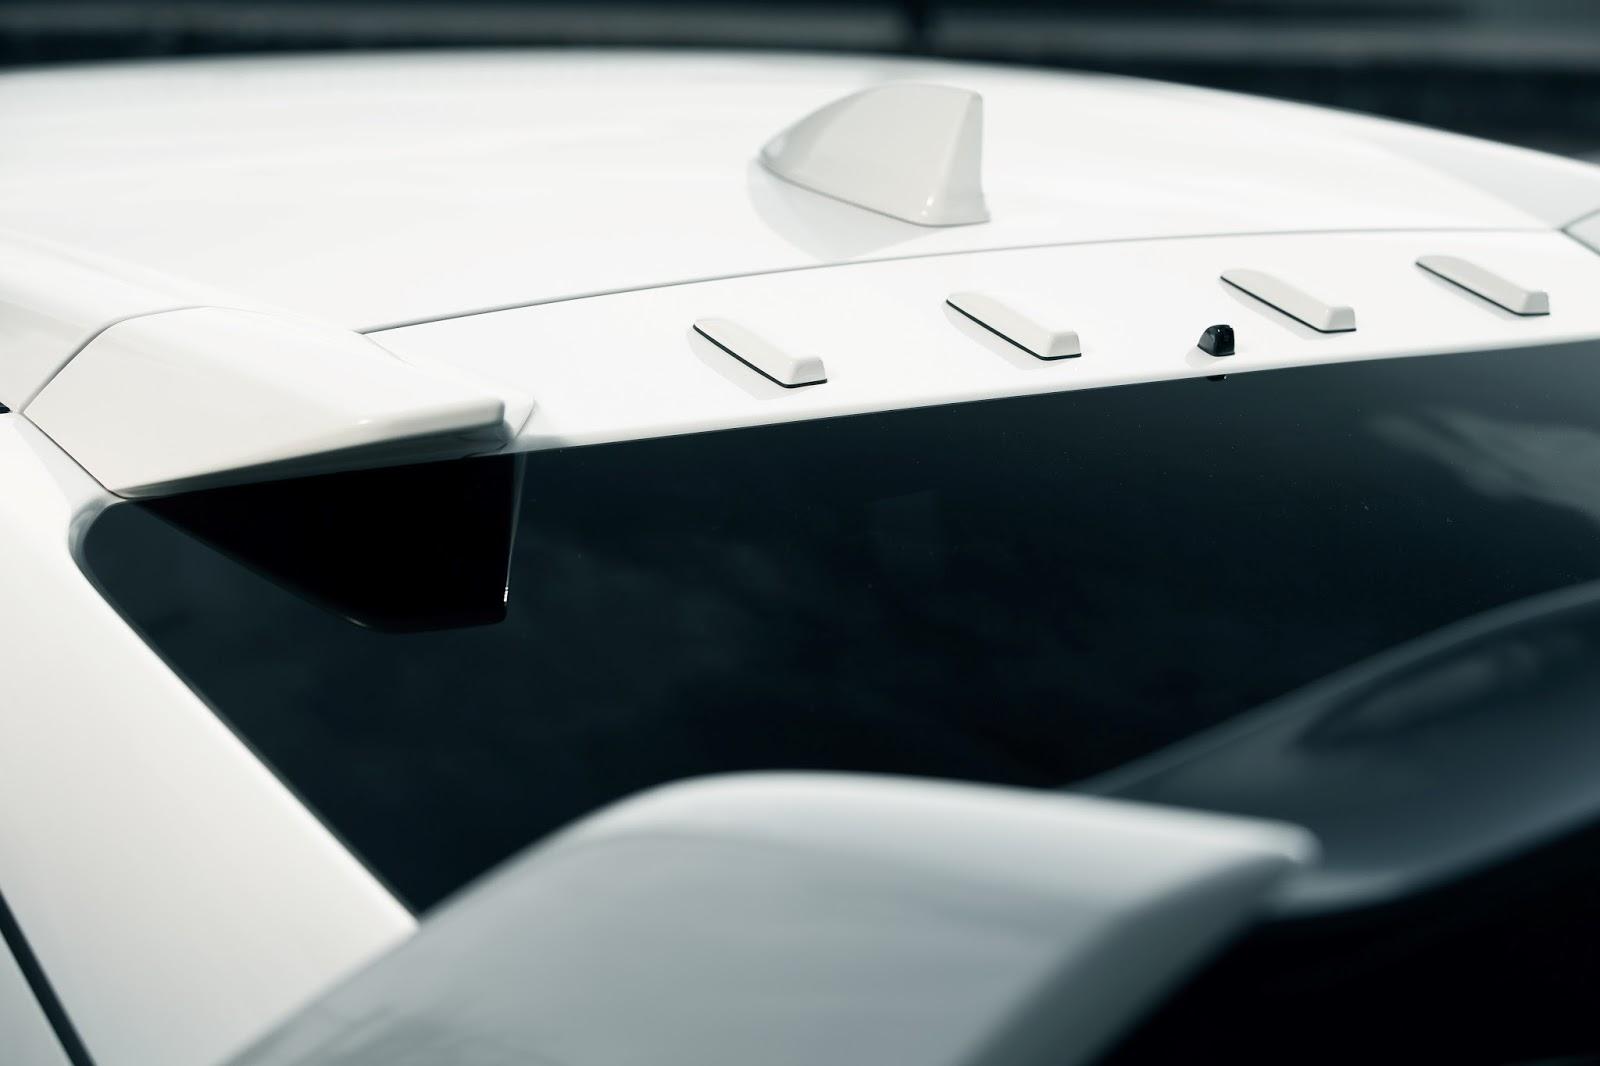 106398 2017 HONDA CIVIC TYPE R SETS NEW FRONT WHEEL DRIVE LAP RECORD AT Το Honda Civic Type-R ανέκτησε το στέμμα του, στην πίστα του Nurburgring Honda, Honda Civic, Honda Civic Type R, Hot Hatch, lap time, Nurburgring, videos, zblog